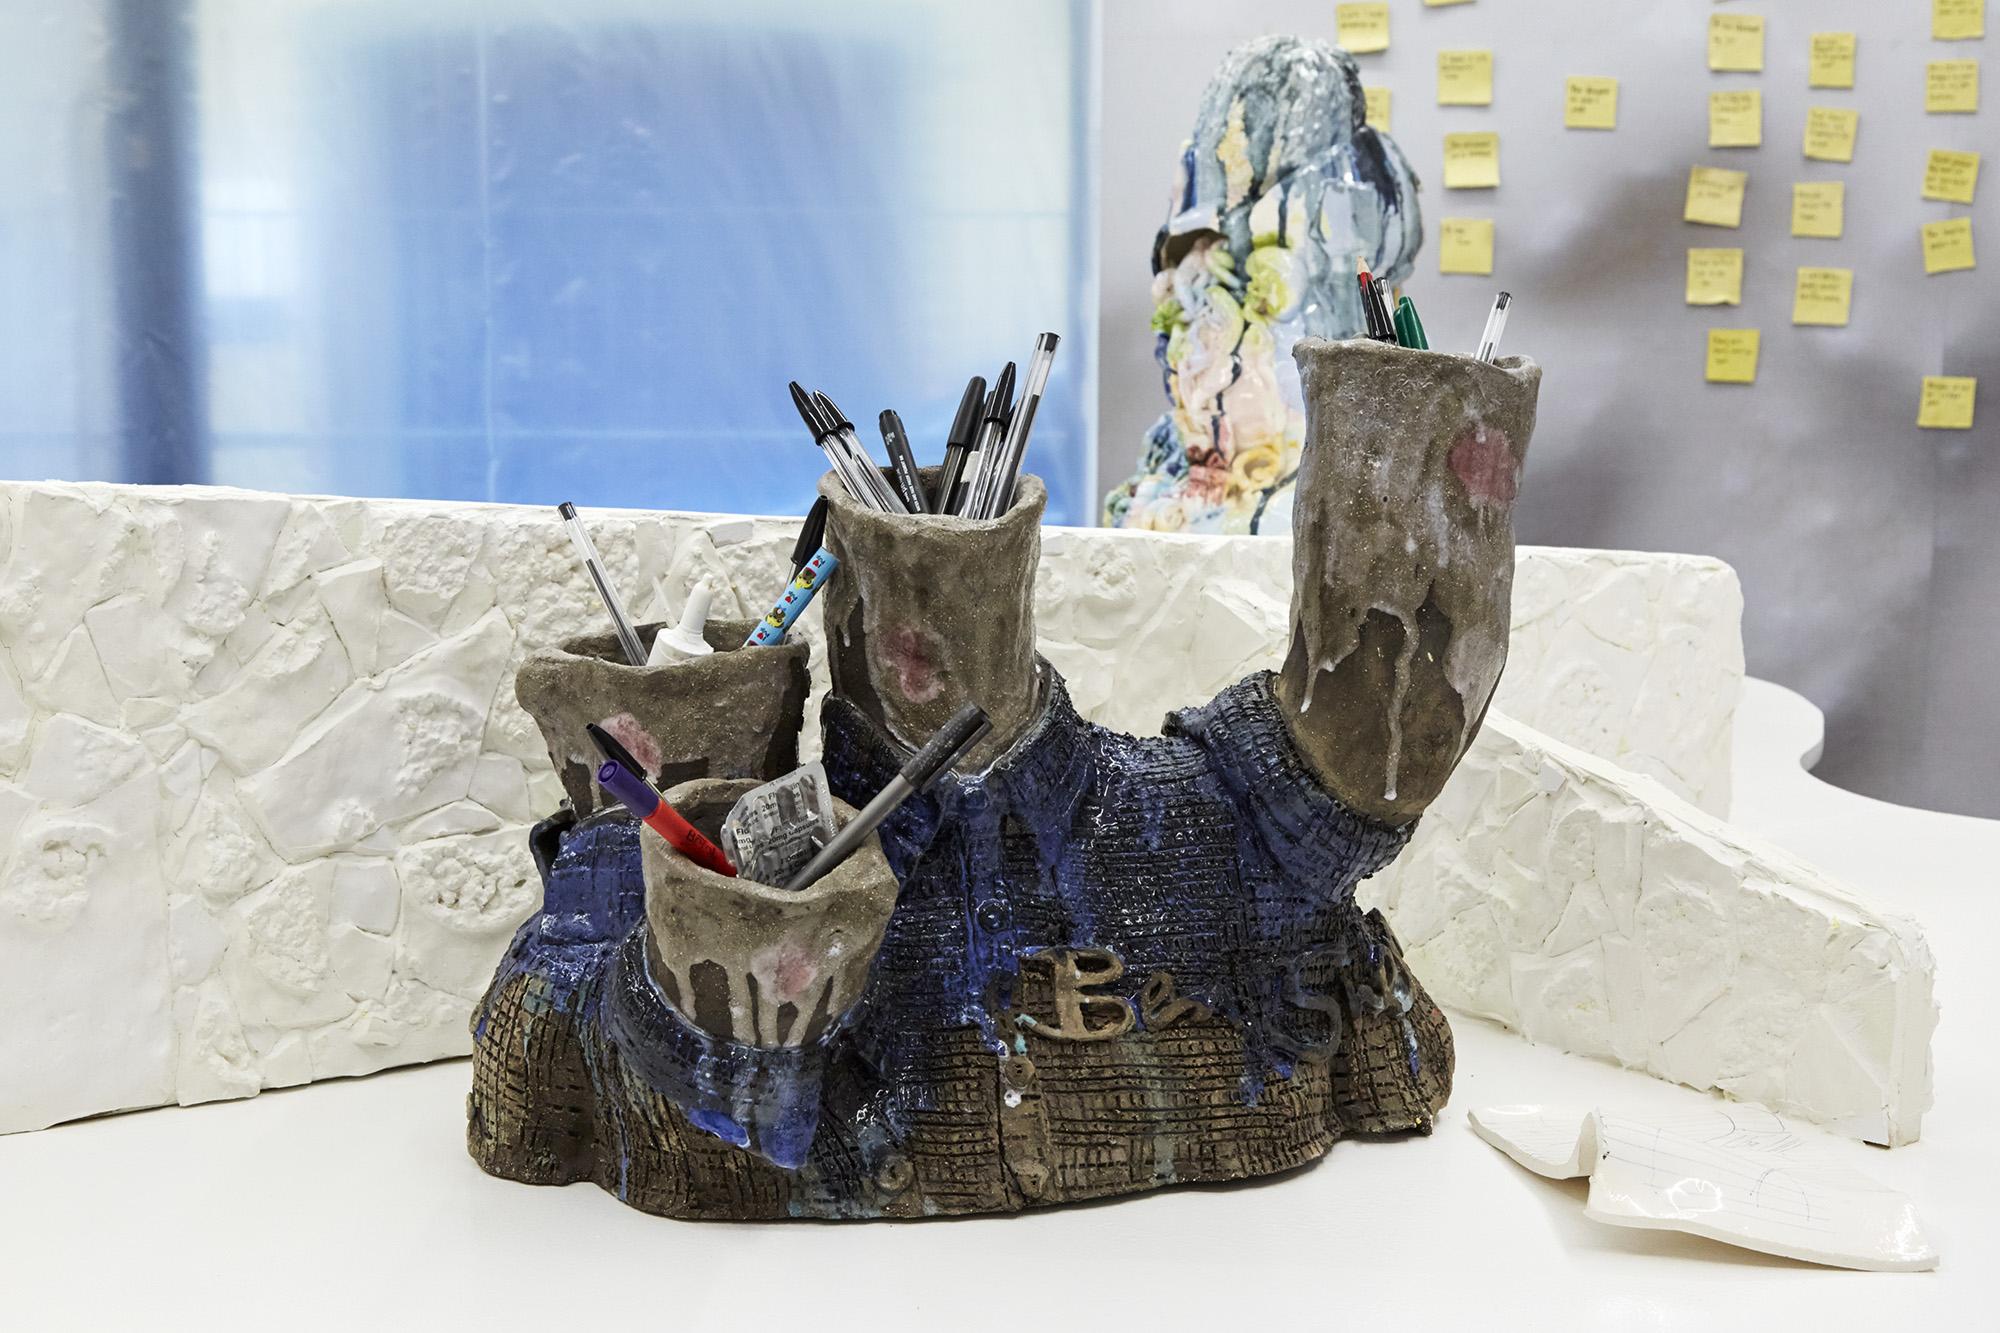 Love bites Glazed ceramic, studio pens, tampons, fluoxetine and First Defence 38 x 46 x 24cm, 2019